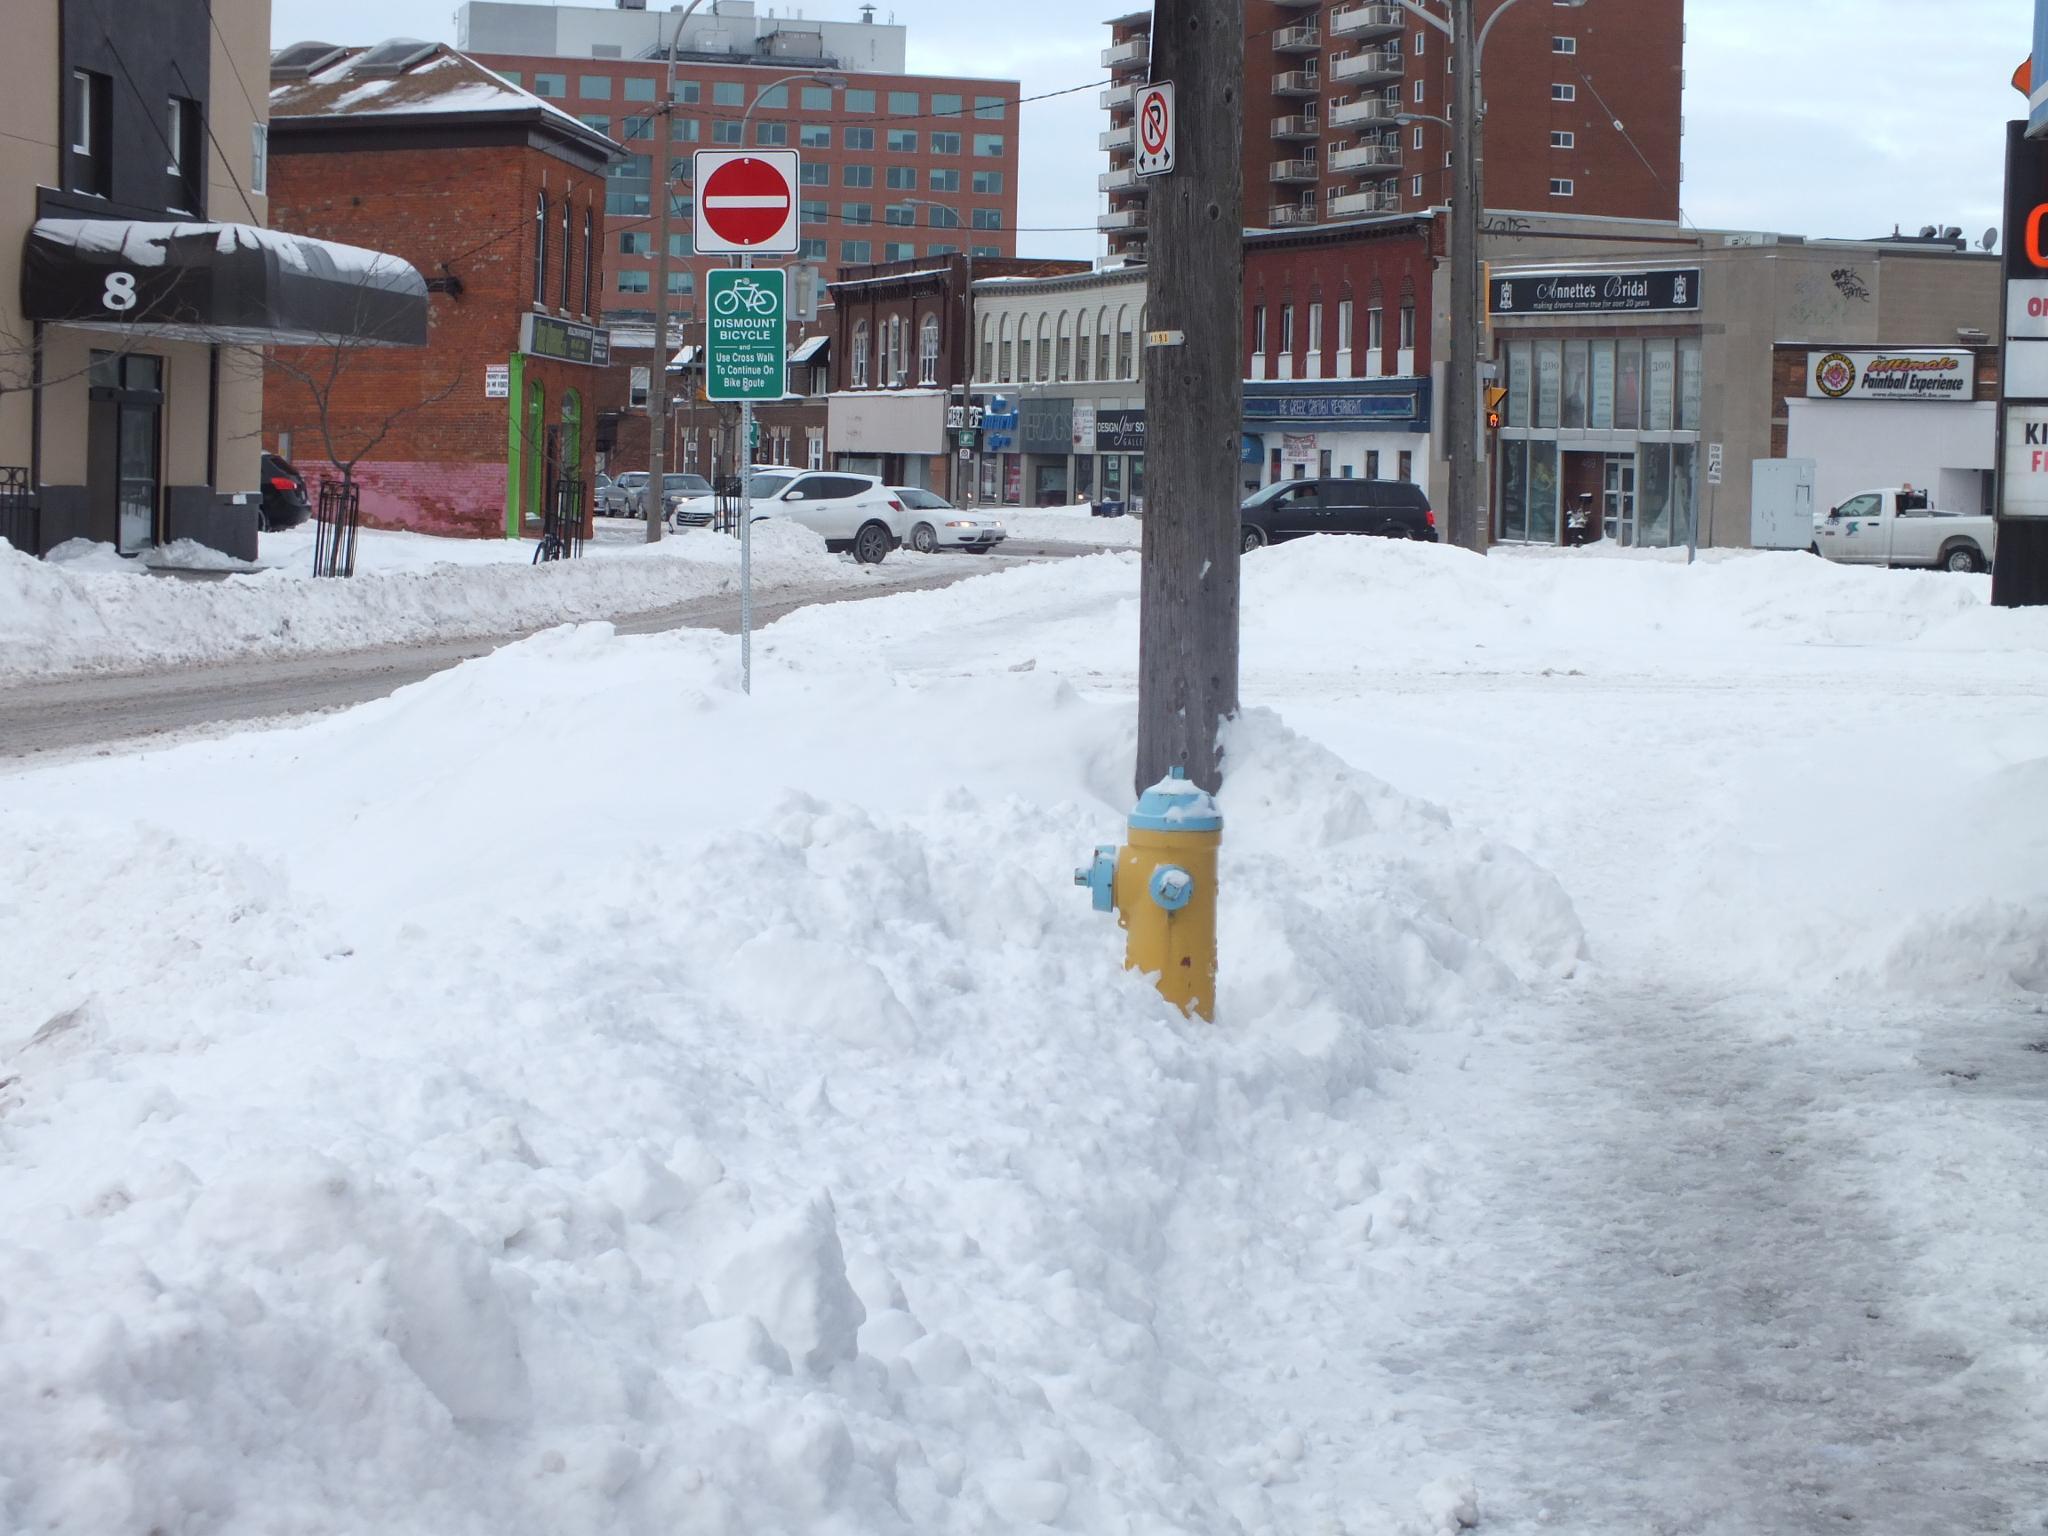 Heading downtown by RegSoper